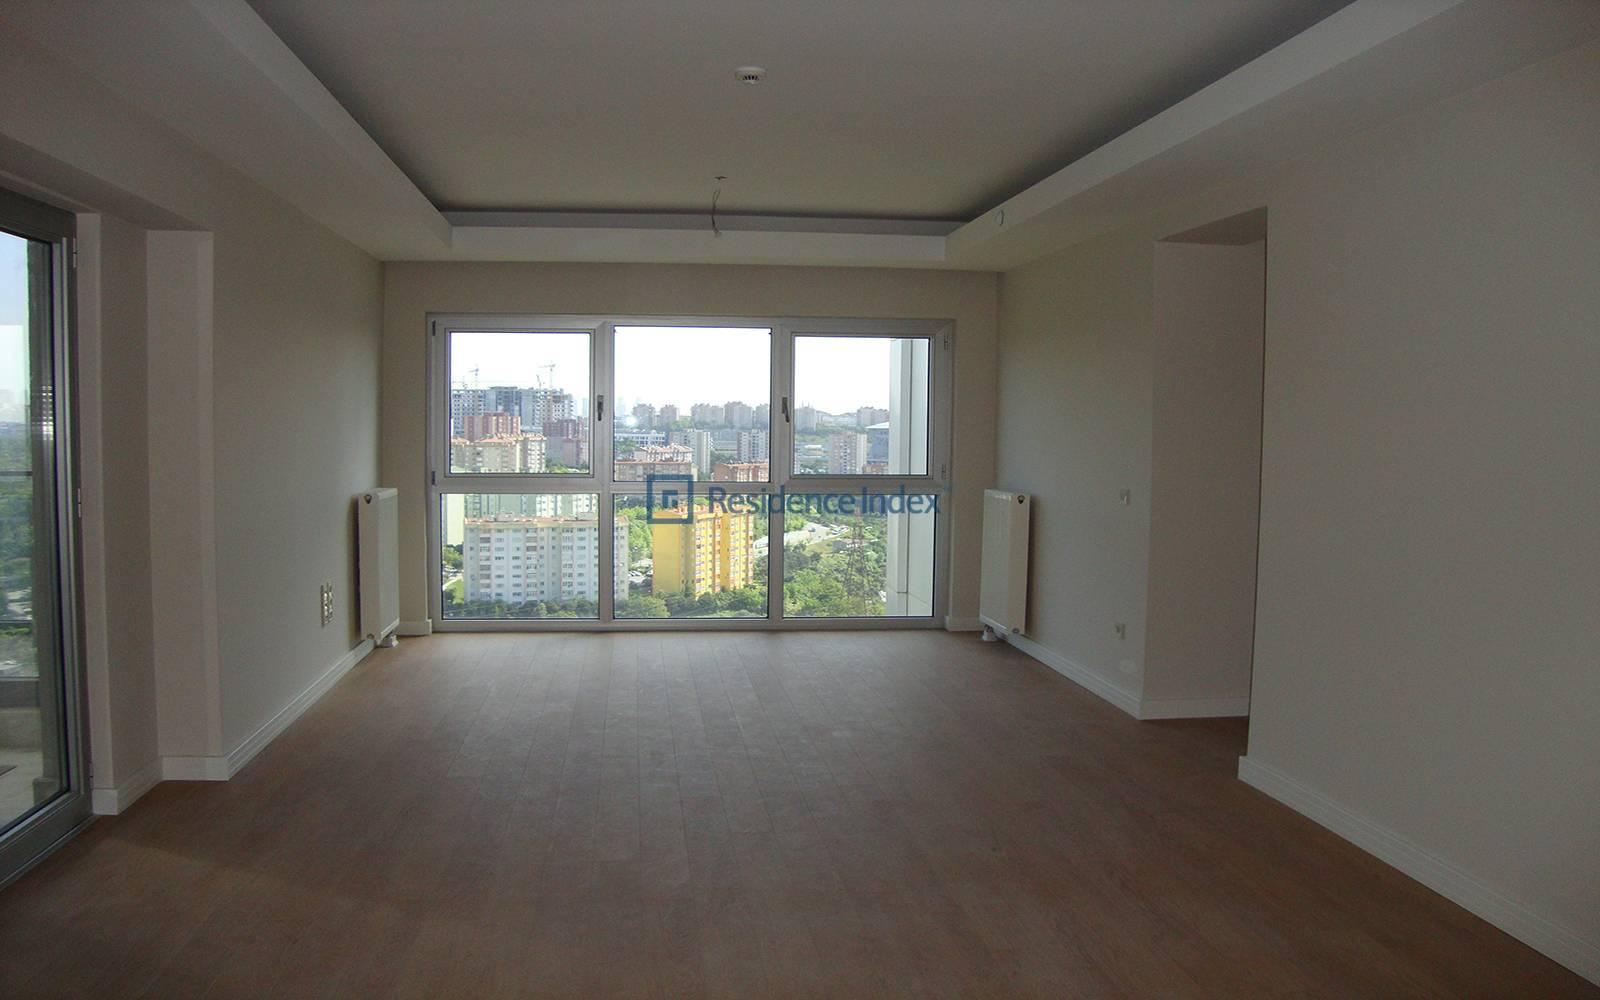 2 + 1 apartment for sale in super location